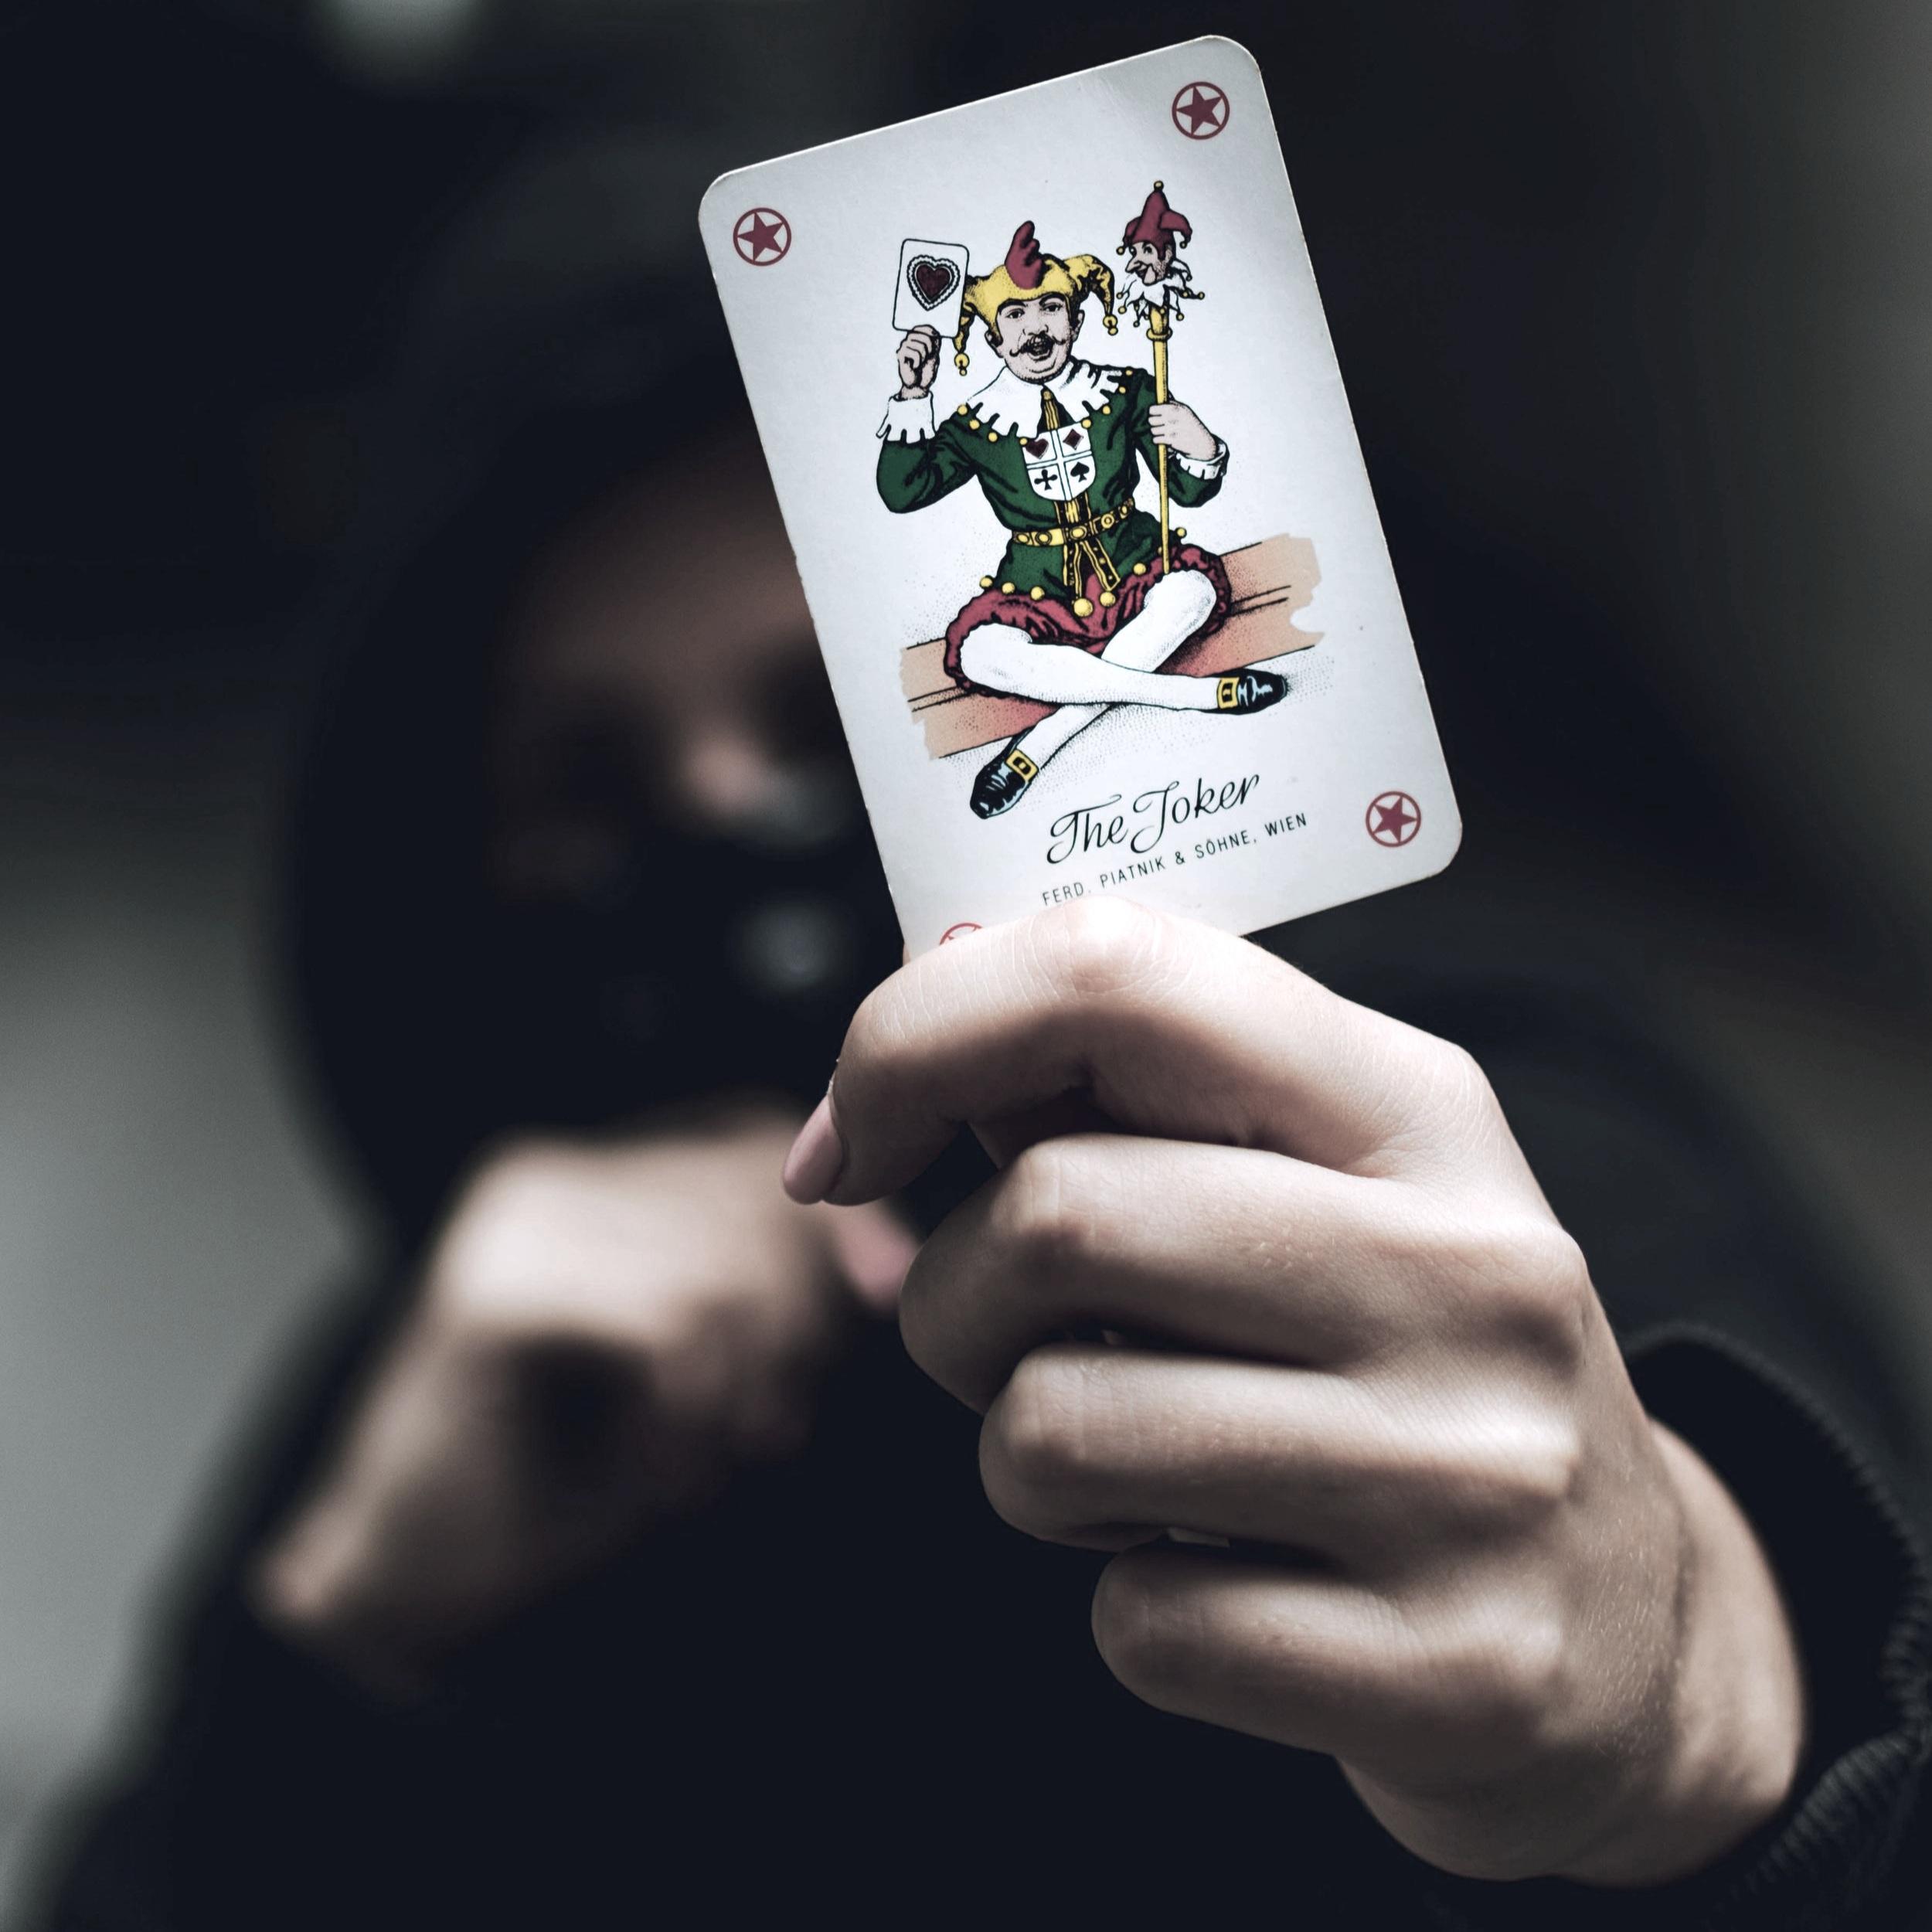 card-close-up-hand-2838511.jpg